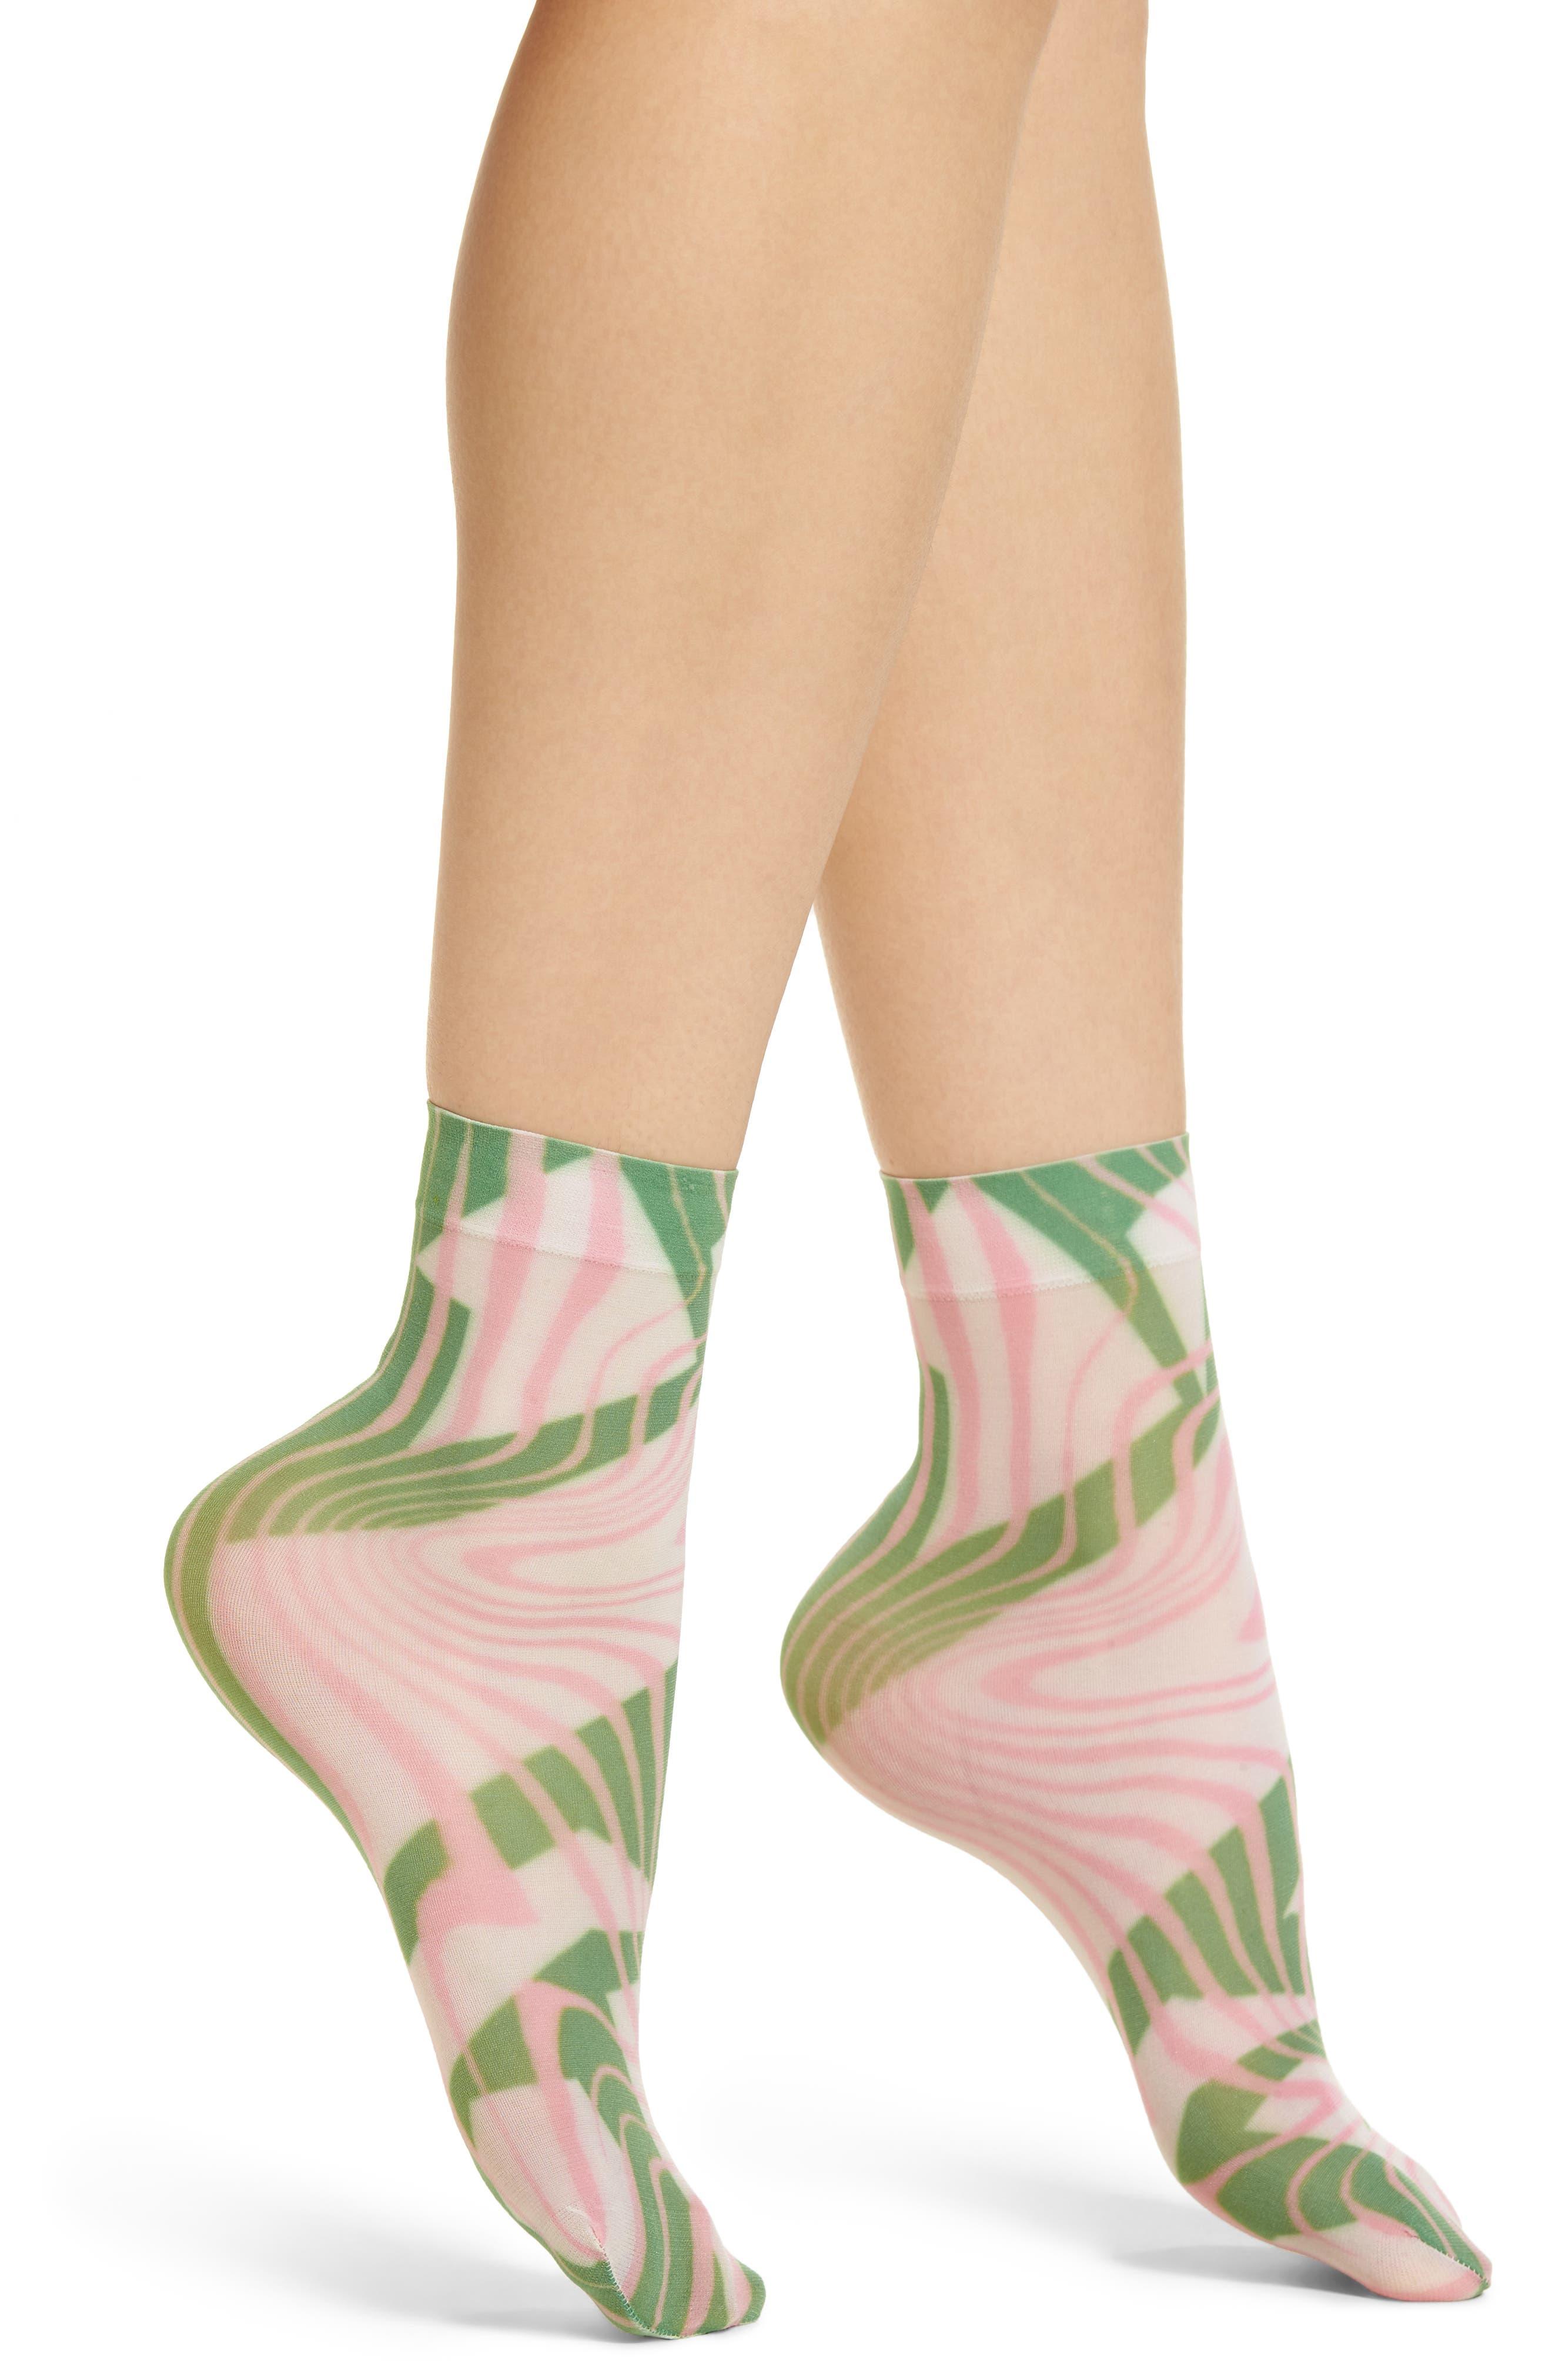 Mia Ankle Socks,                         Main,                         color, 685